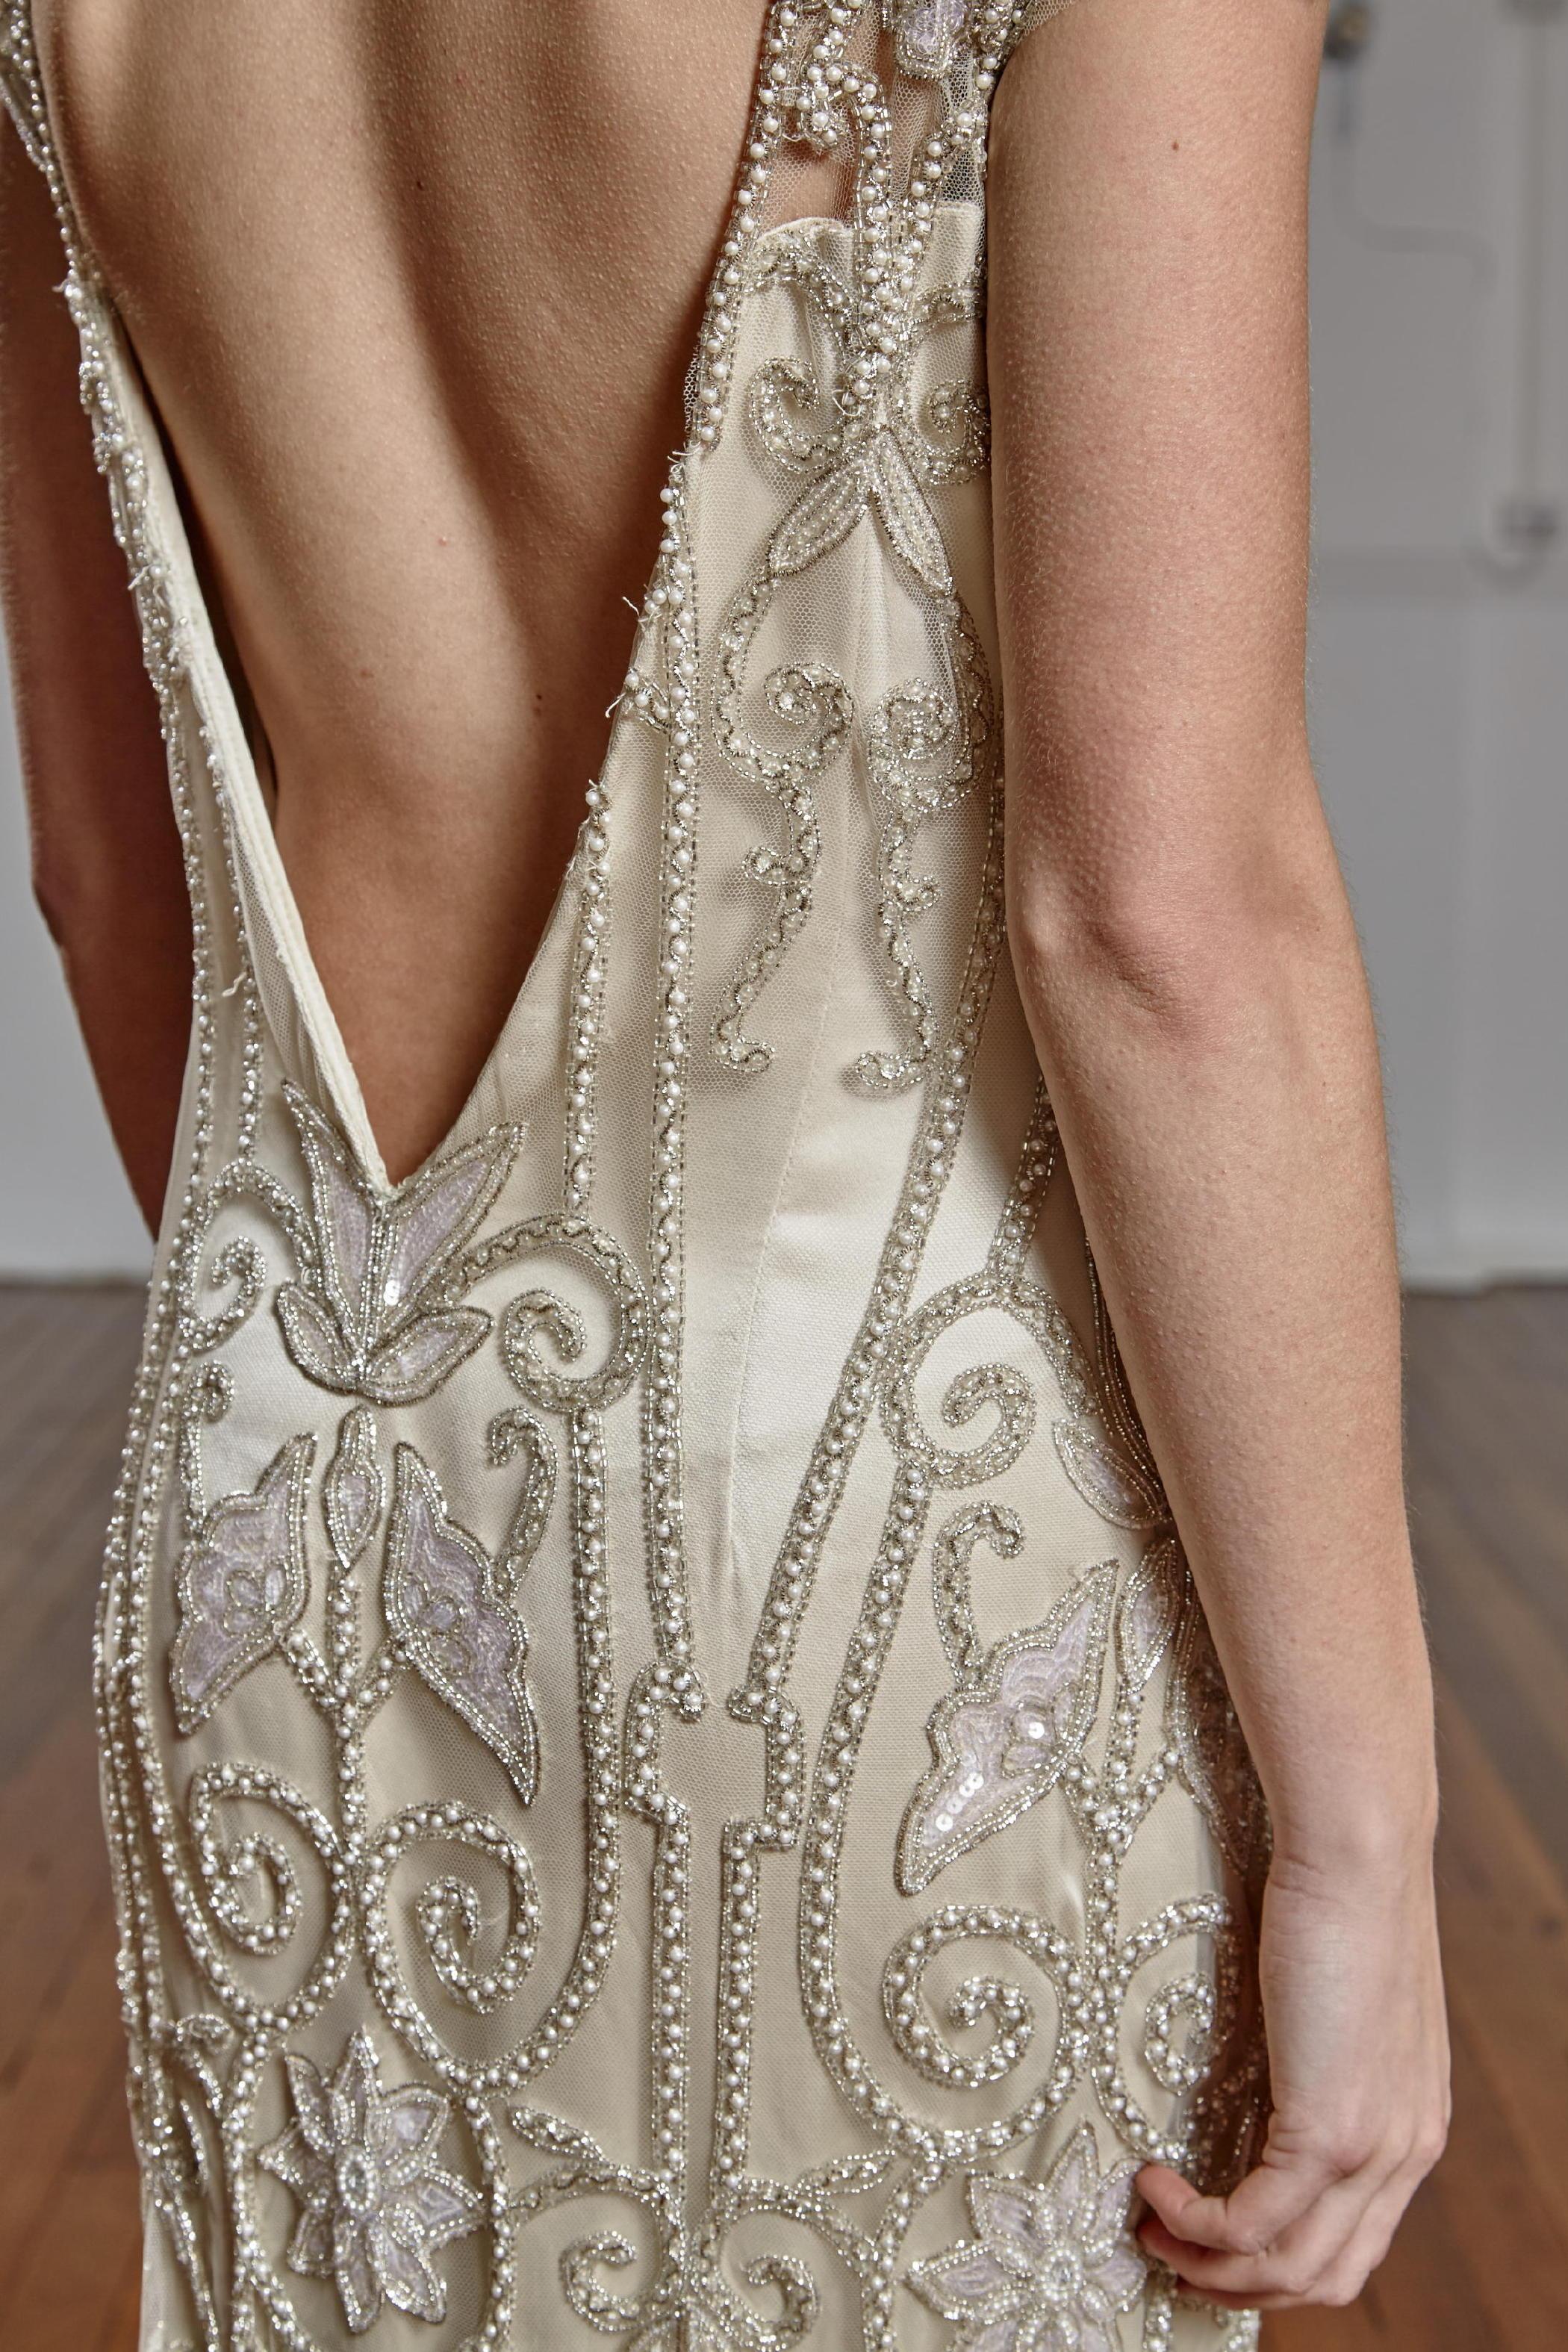 zelda summer bridal gown Tanya Anic Bridal photographyGrant Sparkes Carroll_ double bay sydney bridal (1).jpg